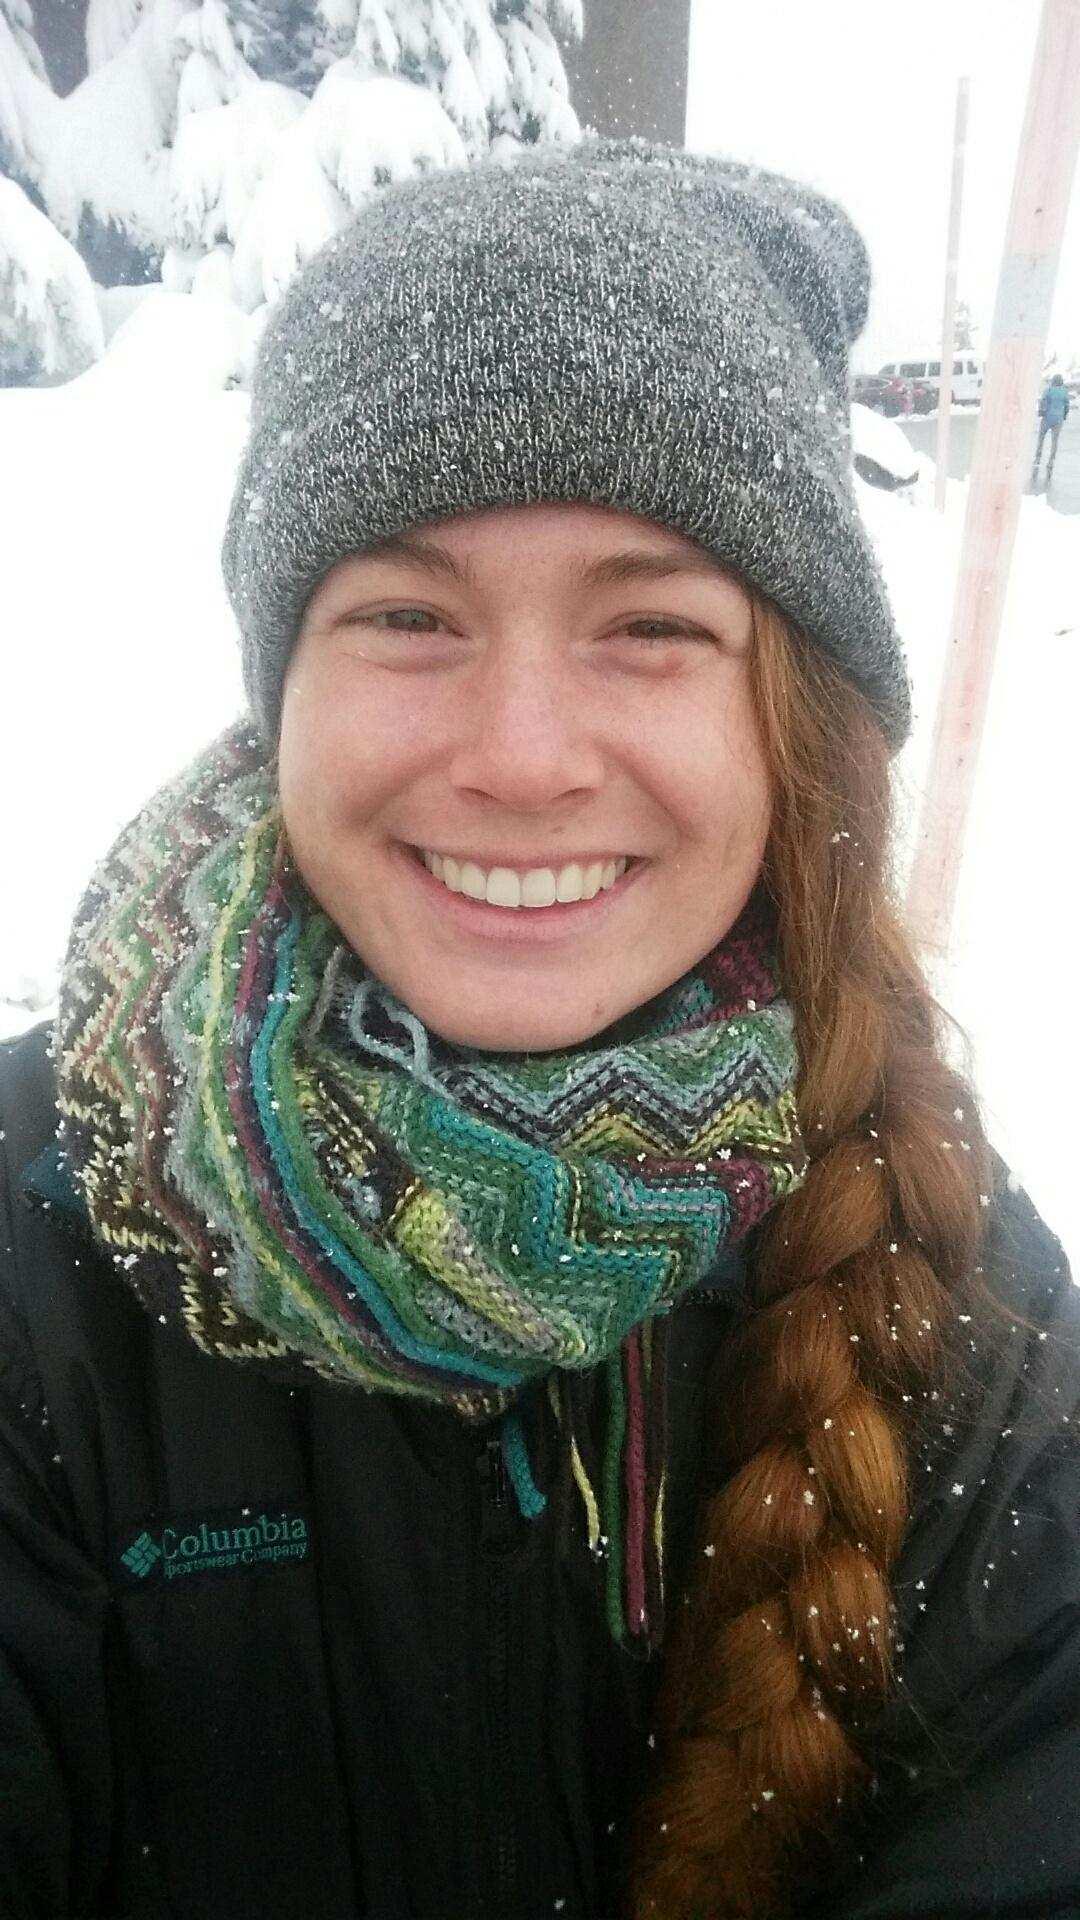 missing, washington, cascades, Rachel Lakoduk, remains found